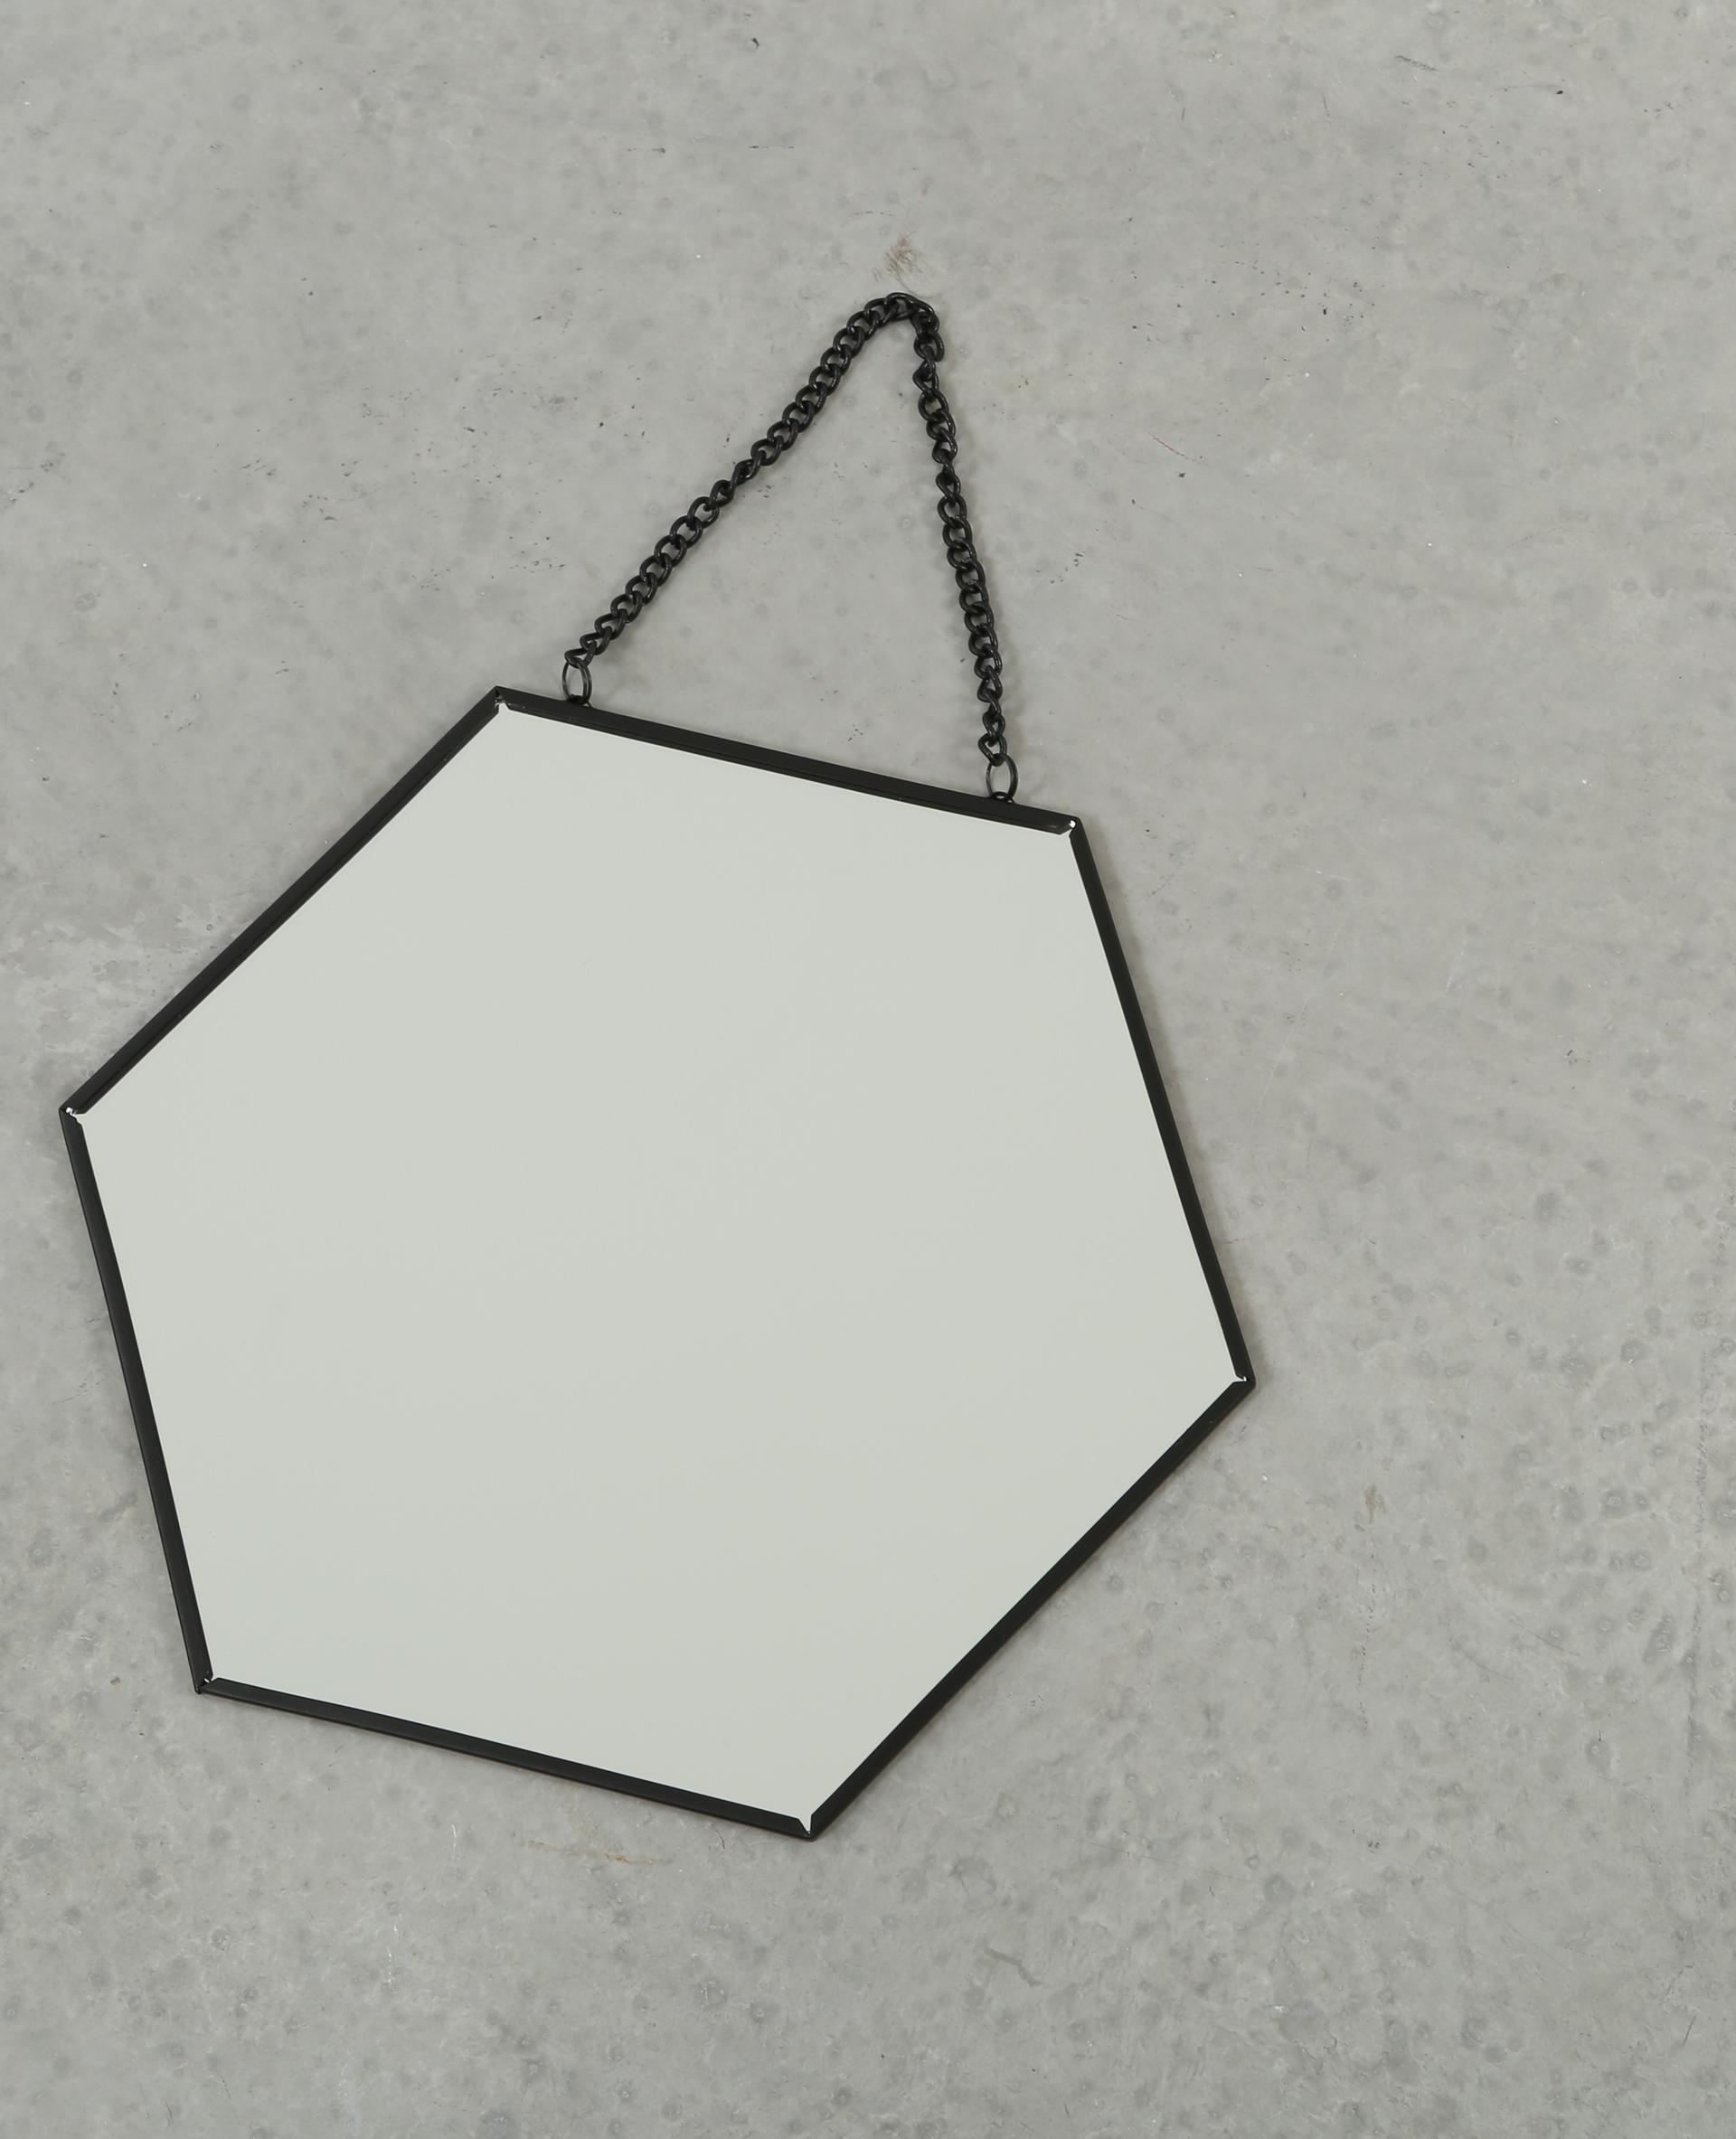 petit miroir hexagonal noir 975083899a4g pimkie. Black Bedroom Furniture Sets. Home Design Ideas